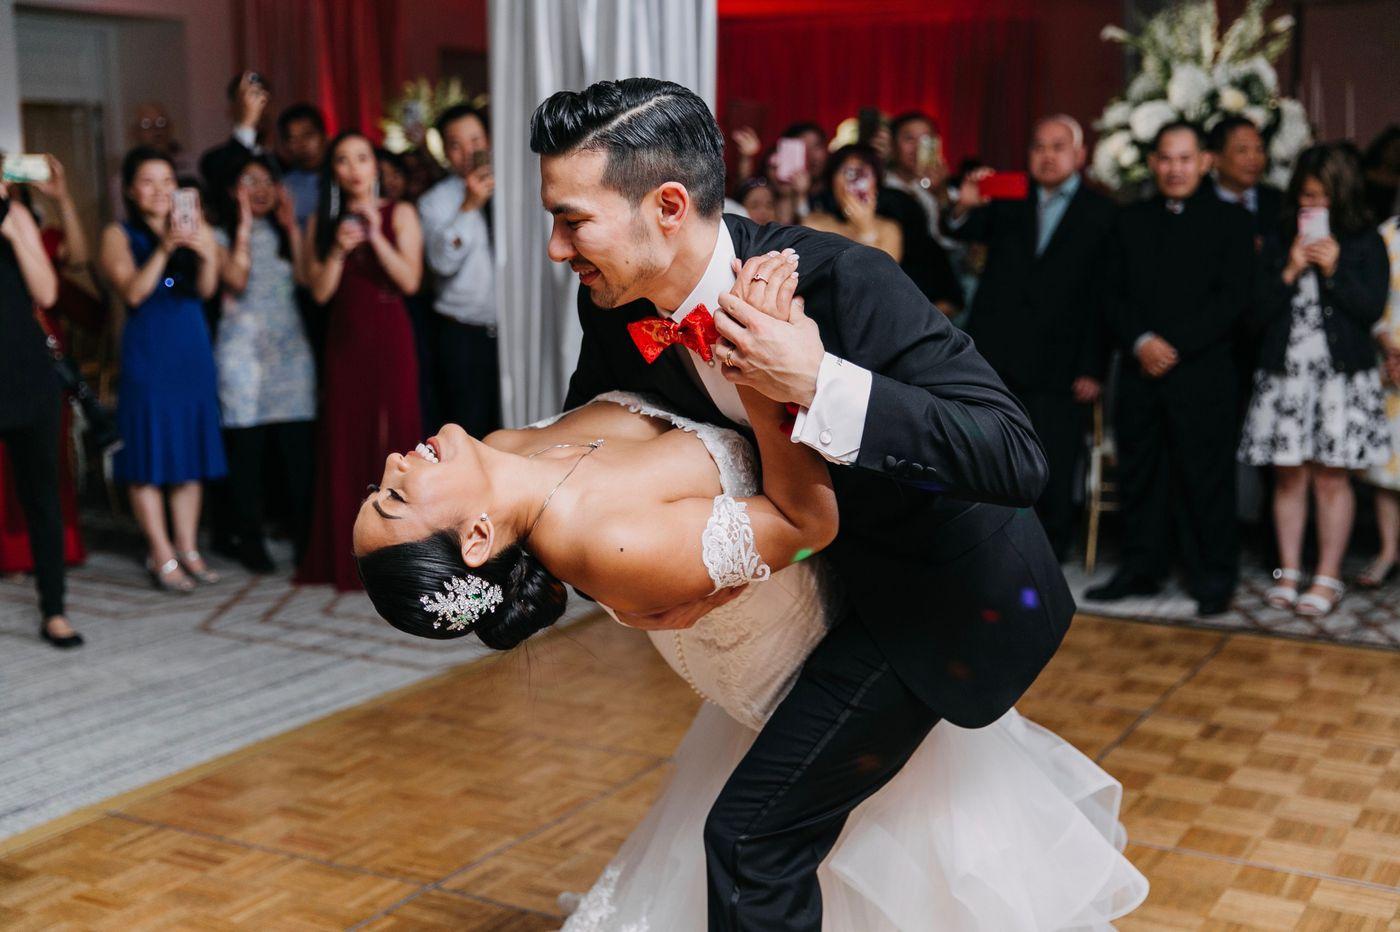 Philadelphia weddings: Aimy Tran and Henry Chou Jr.